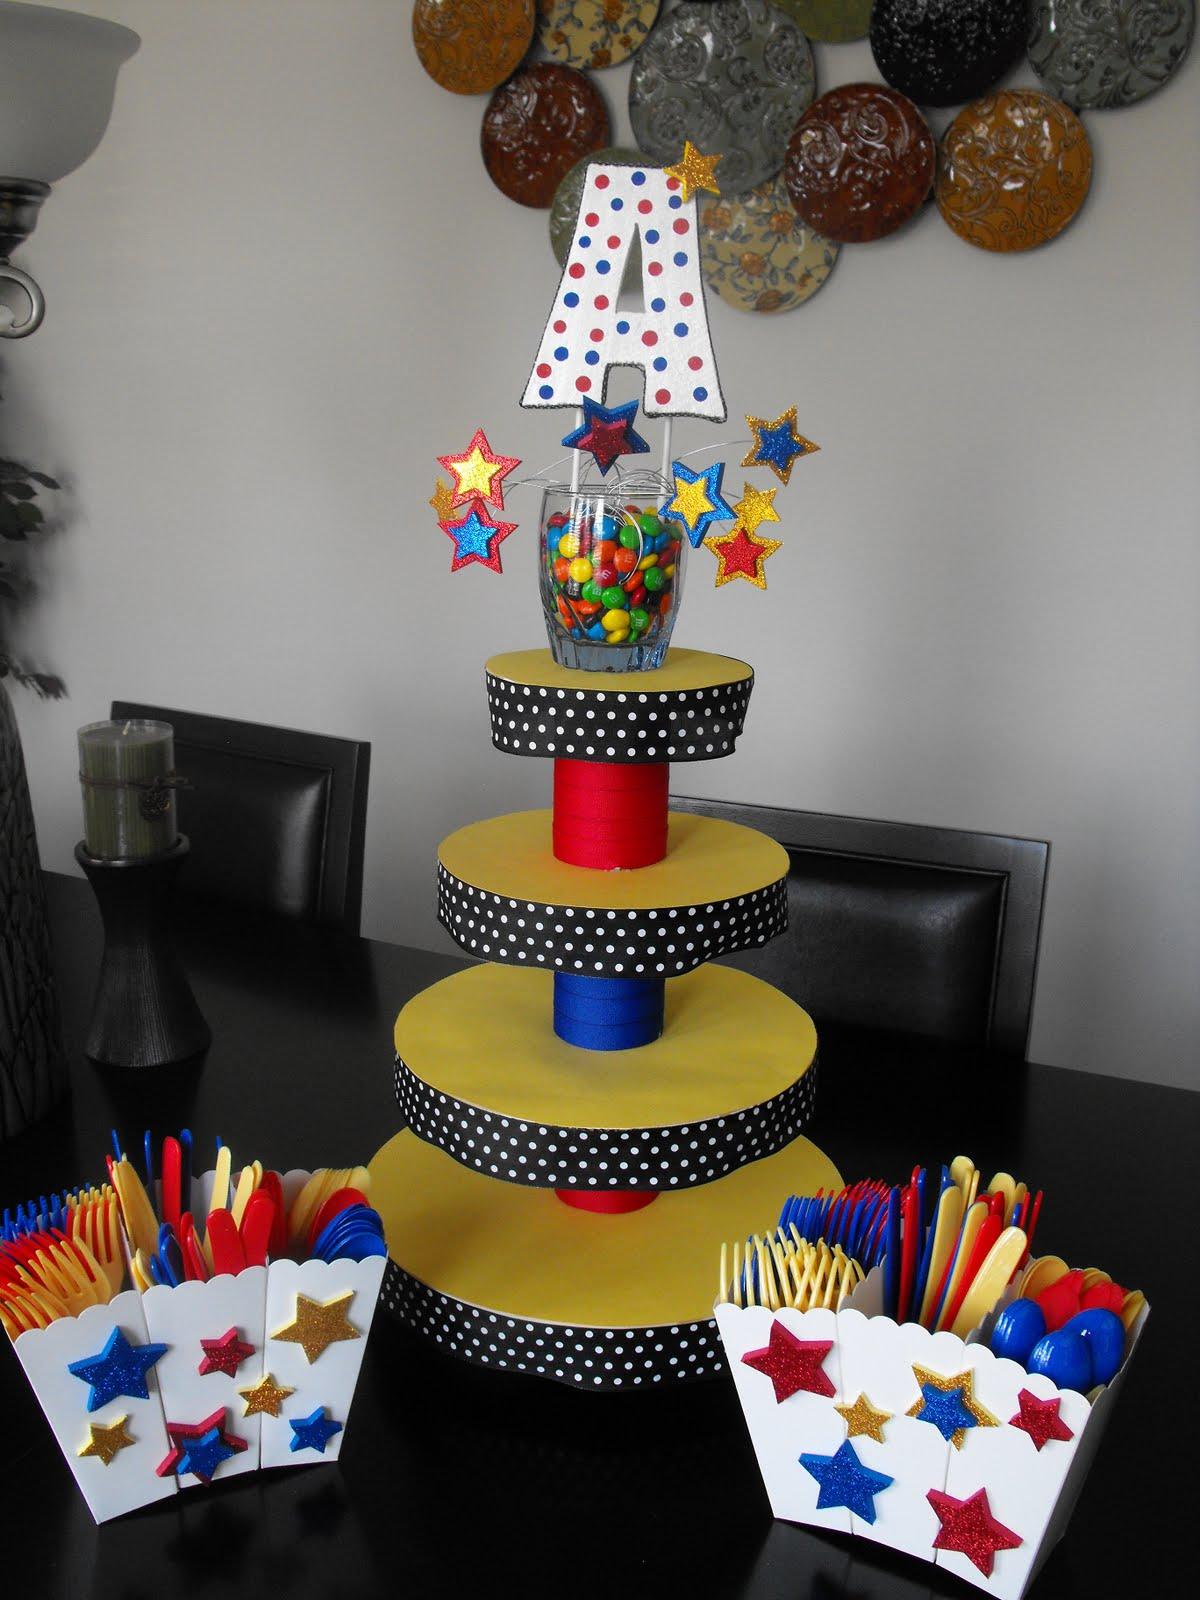 aj 39 s cupcakes diy cupcake stand. Black Bedroom Furniture Sets. Home Design Ideas